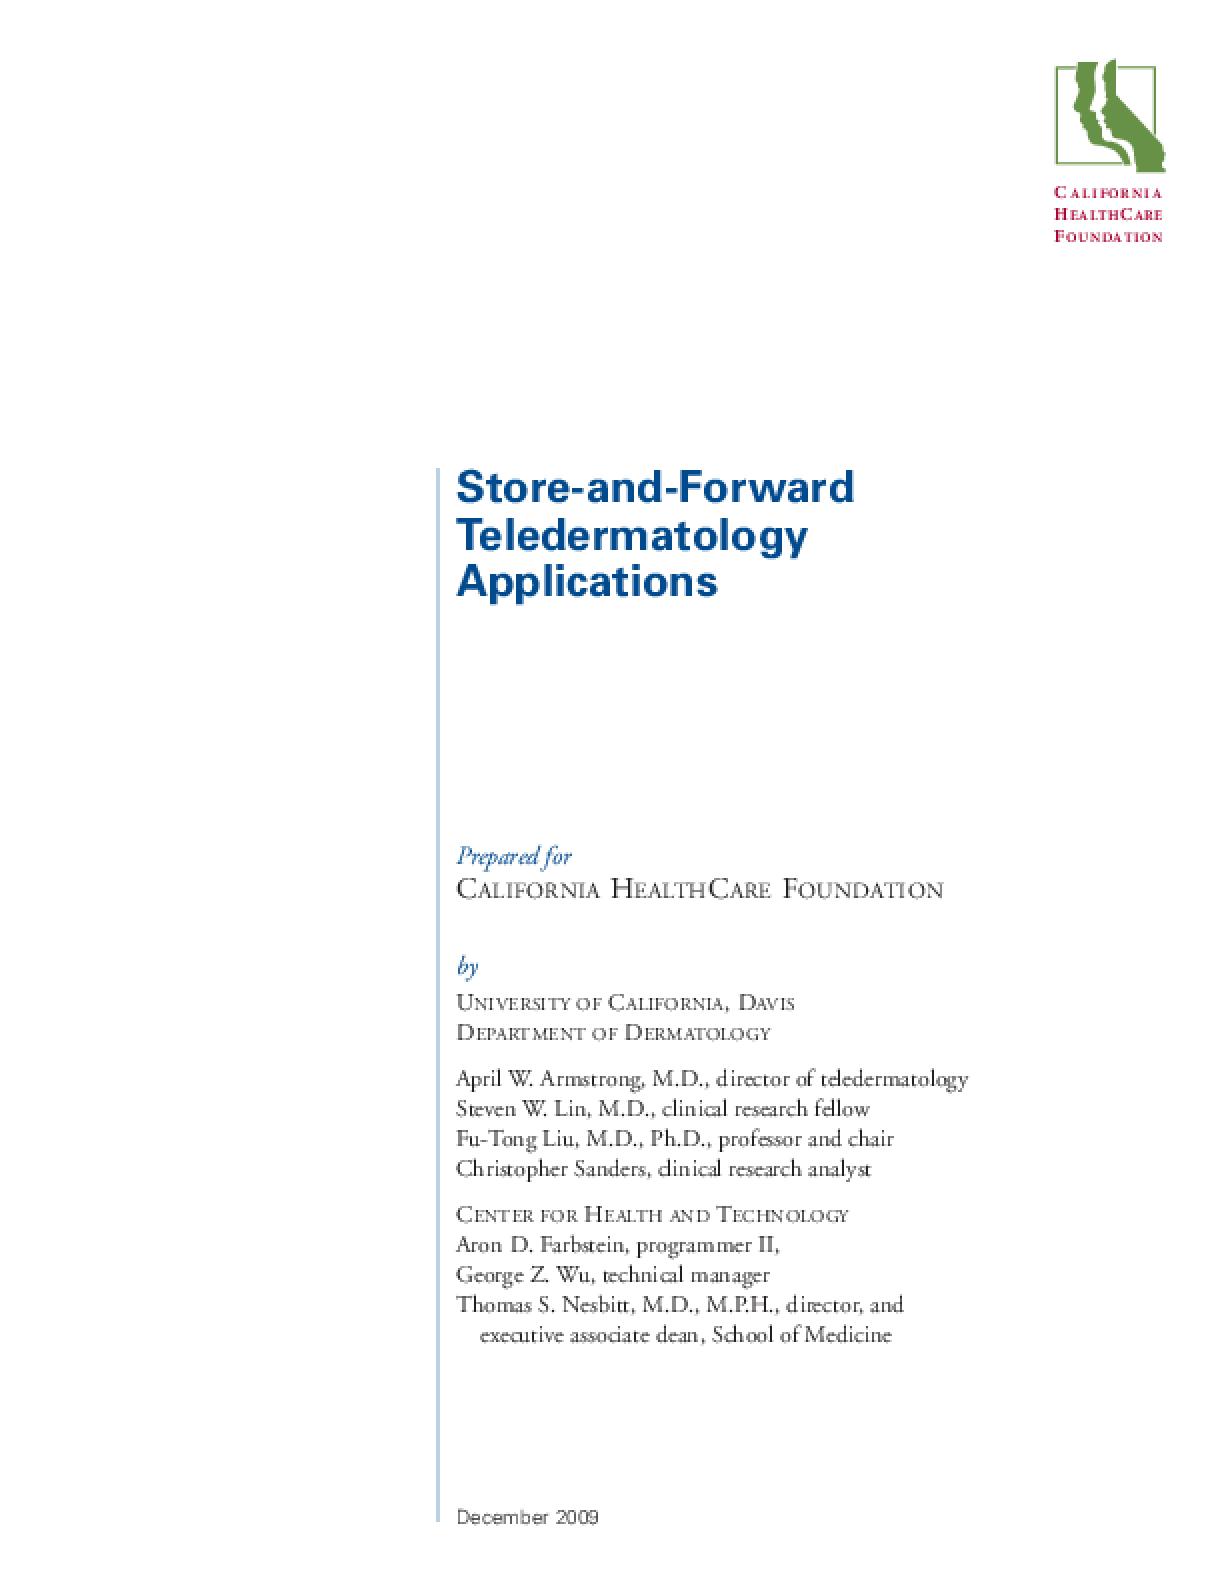 Store-and-Forward Teledermatology Applications